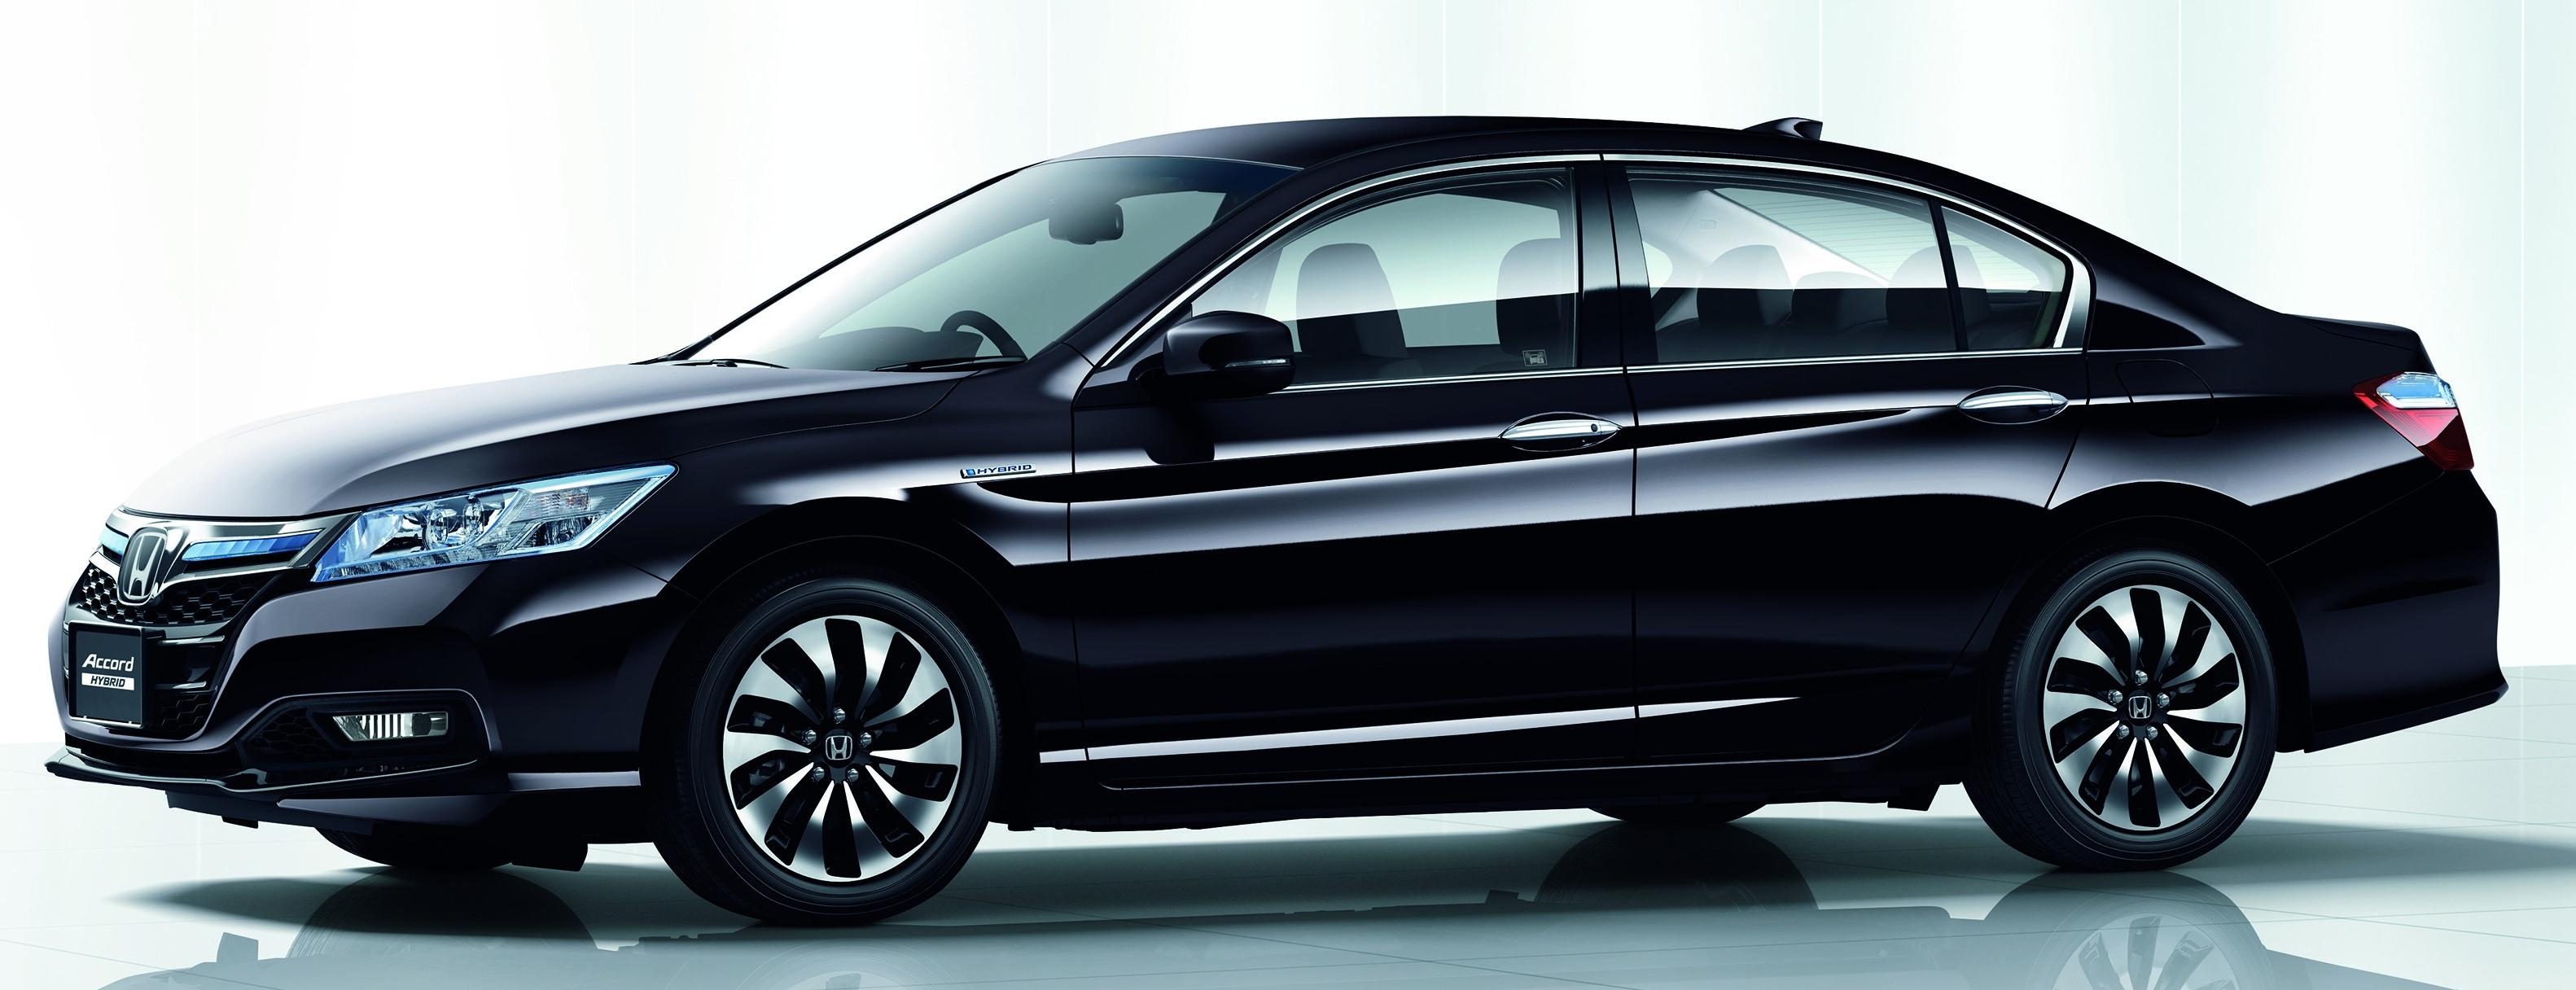 Honda accord hybrid assembly in thailand and malaysia for Honda accord us news